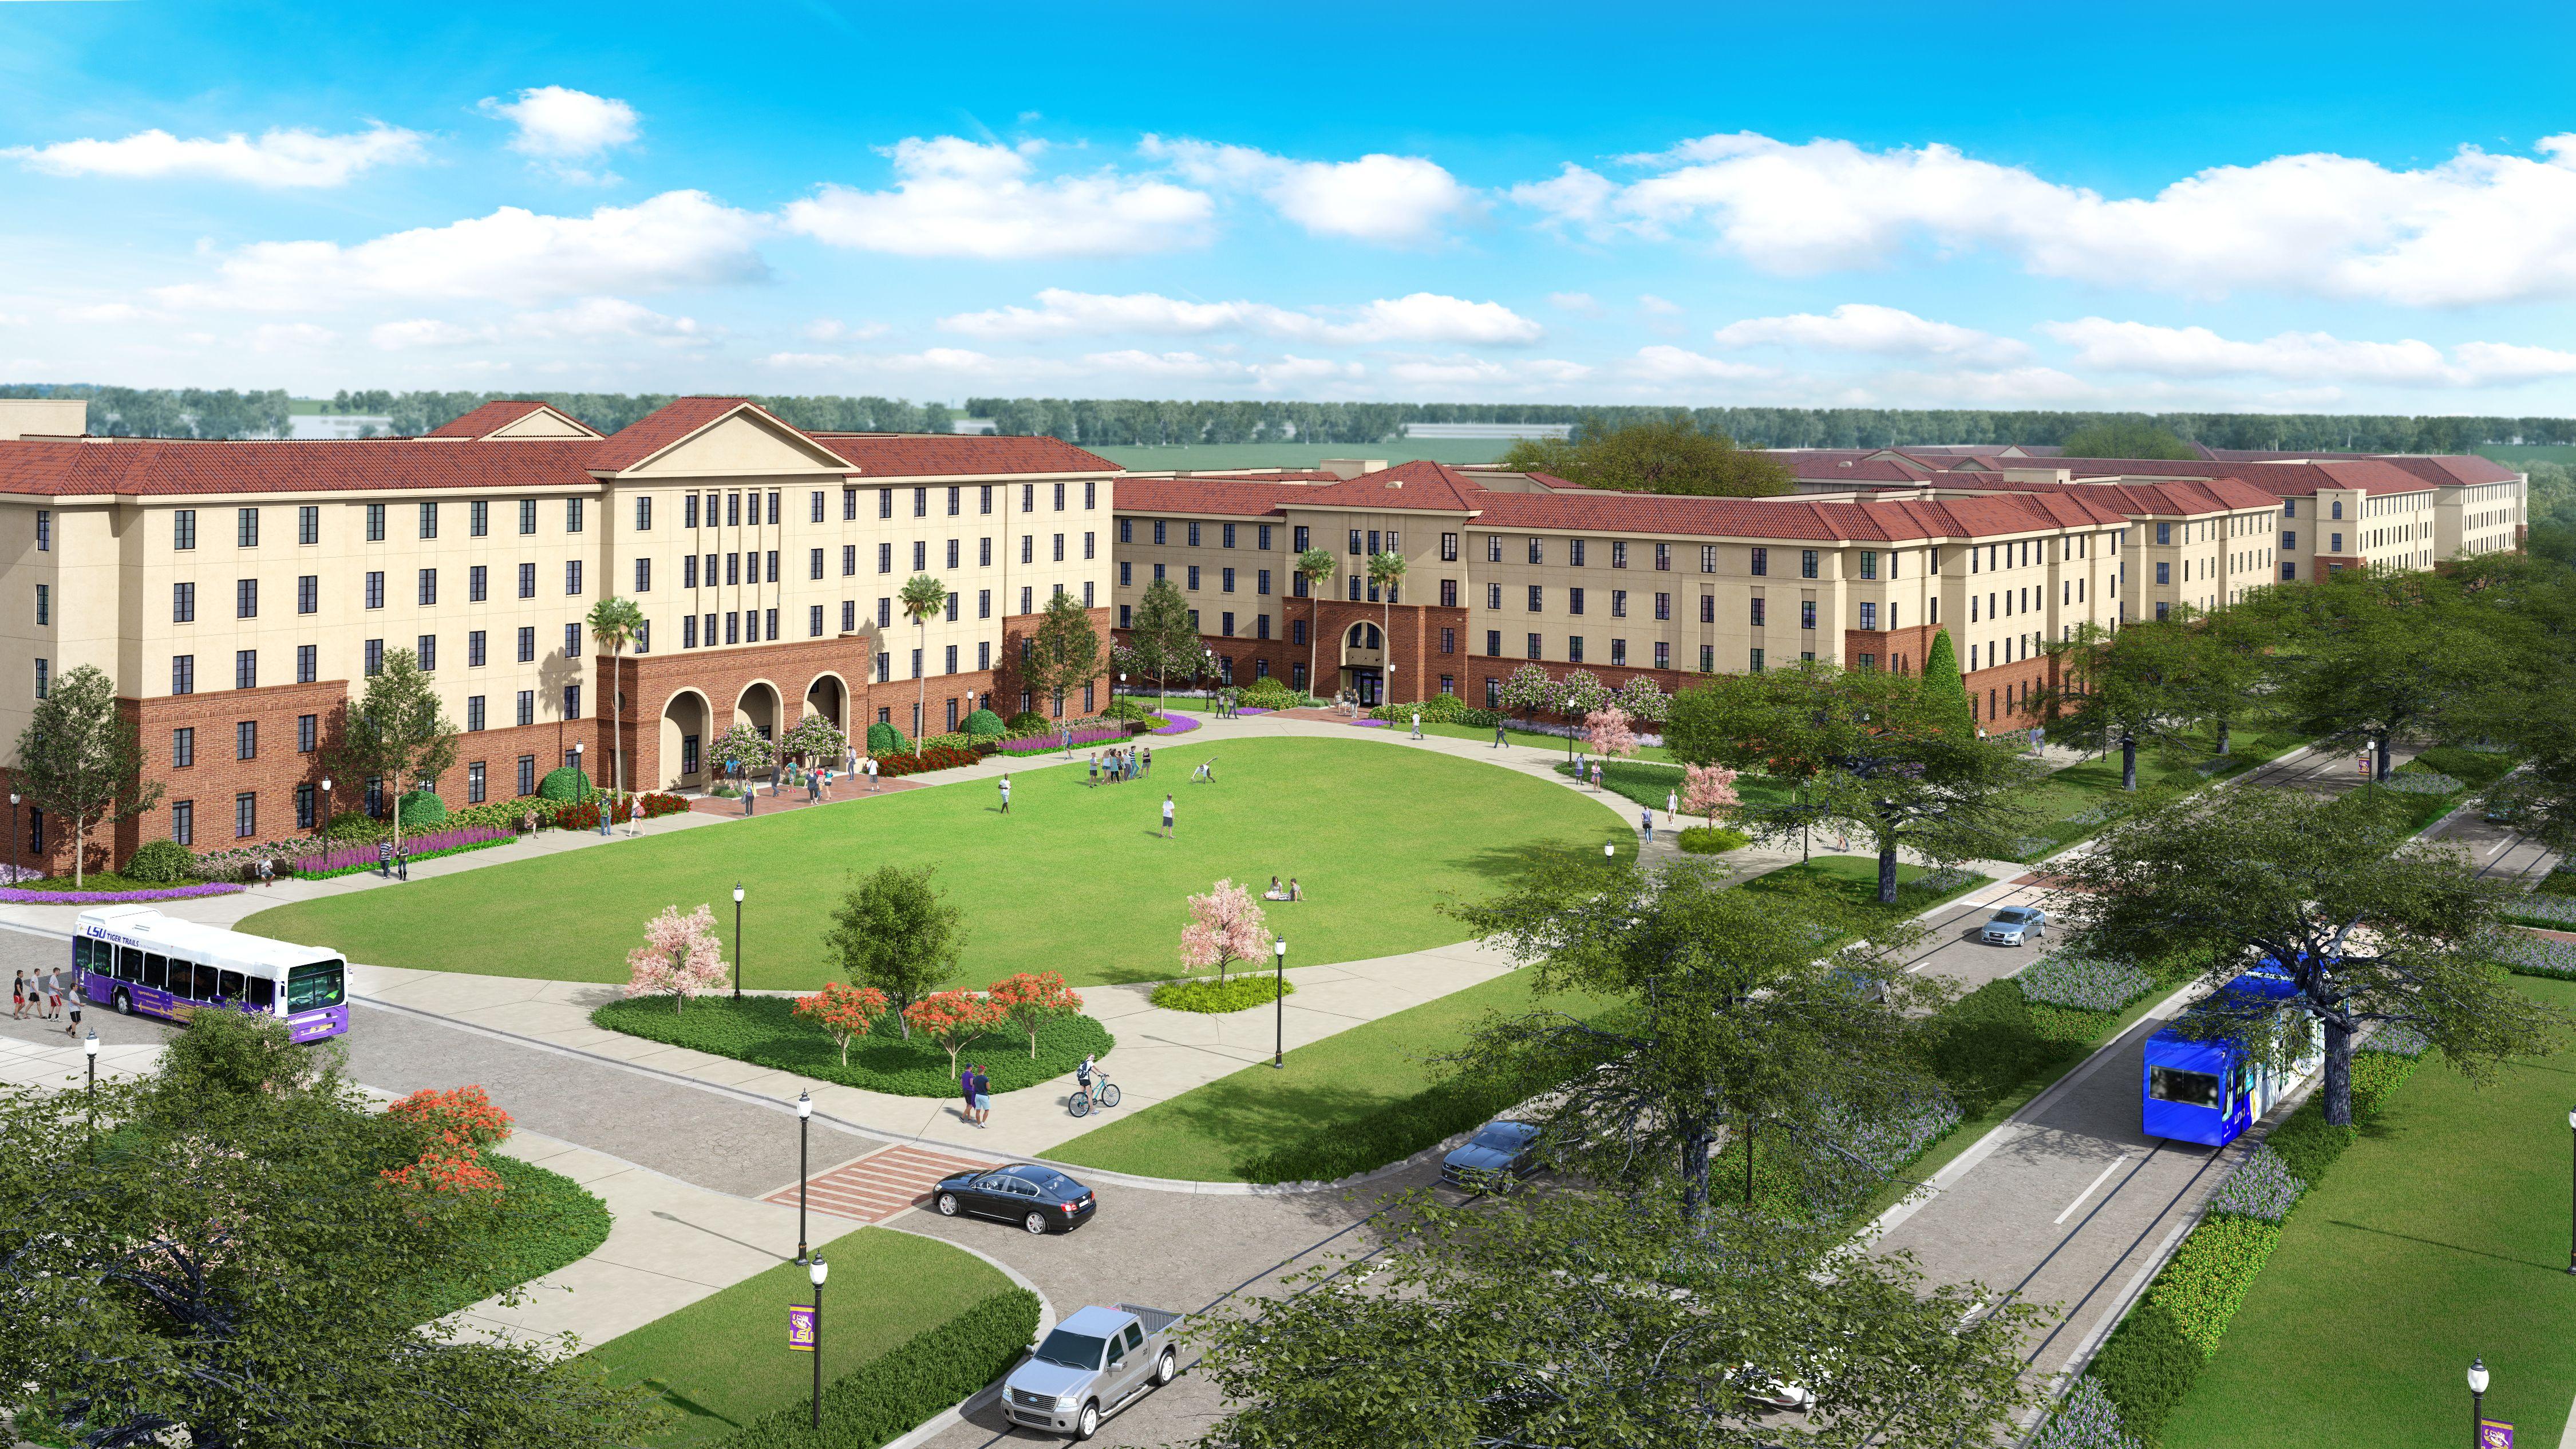 Lsu Nicholson Gateway Apartments Lsu College Lsu Student Lsu